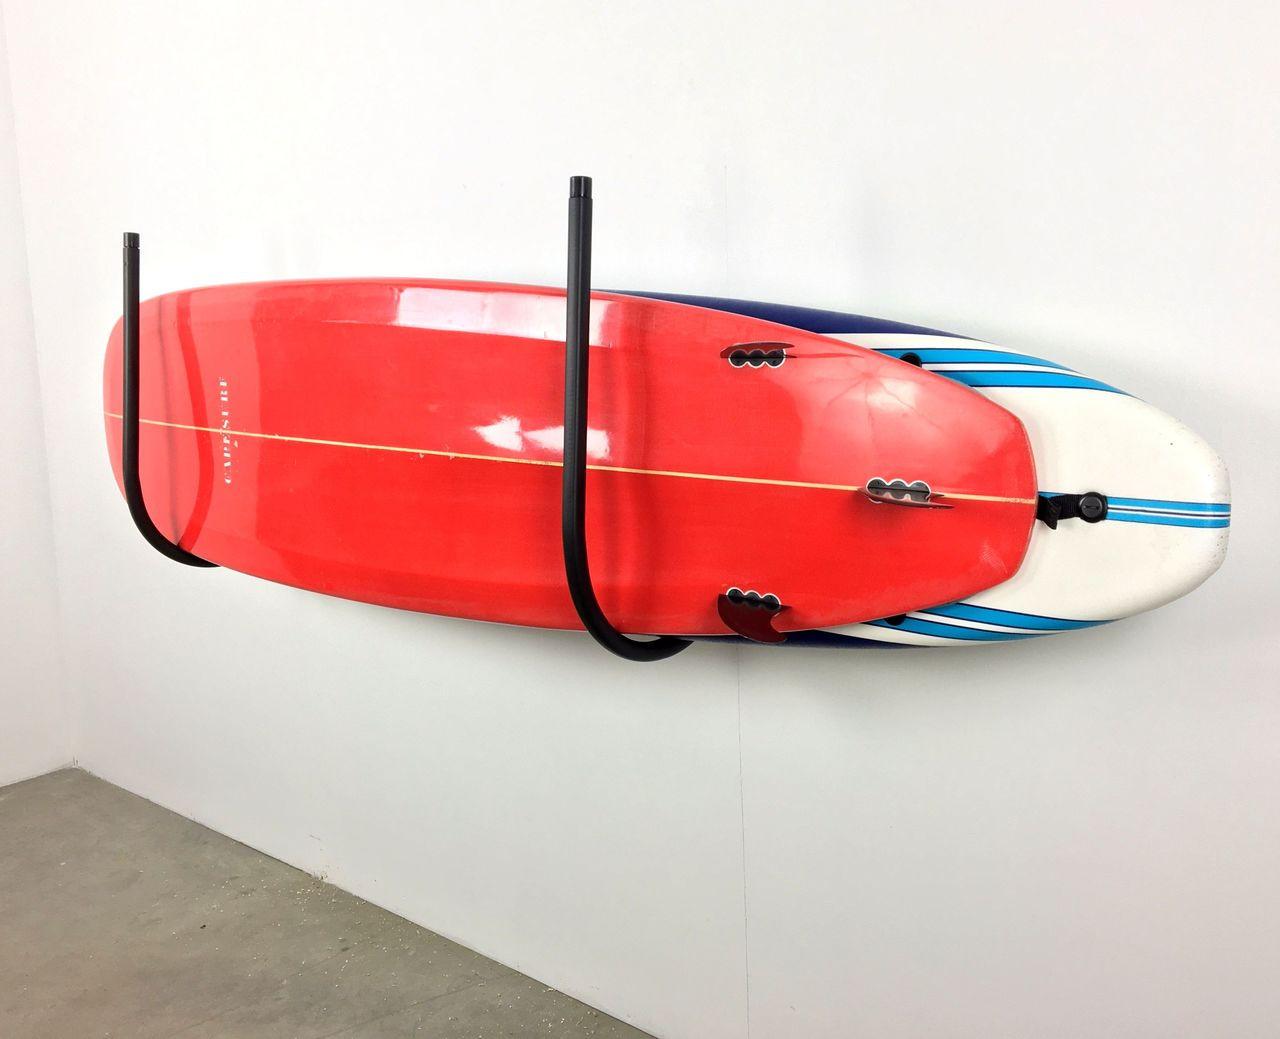 SUP & Surfboard Wall Rack | Hi-Port 1 Storage Mount